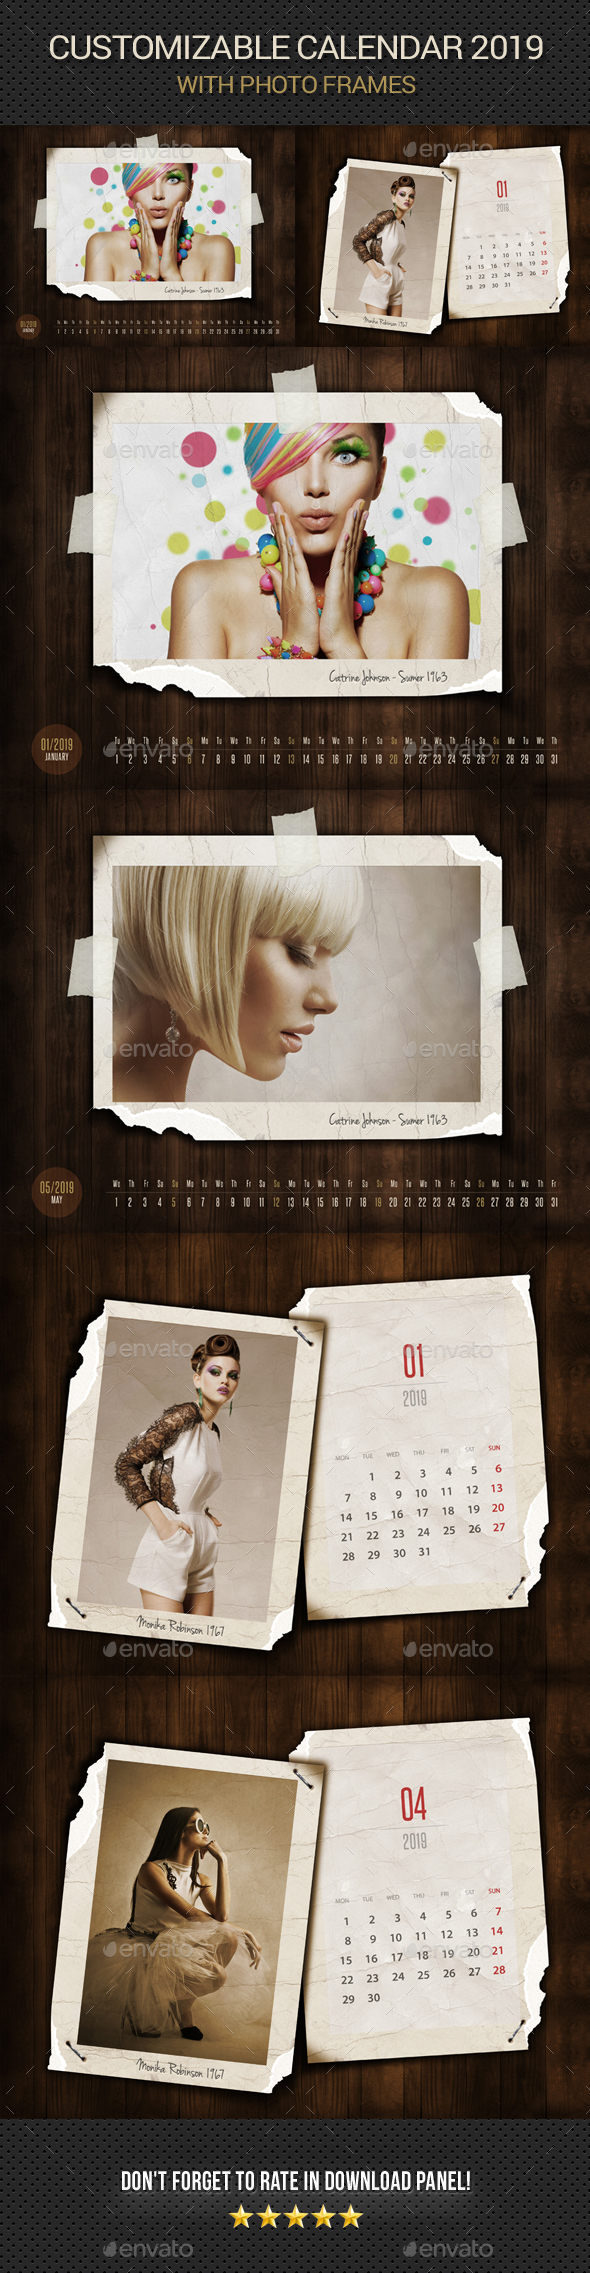 Customizable Vintage Calendar 2019 Photo Frame V08 - Photo Templates Graphics